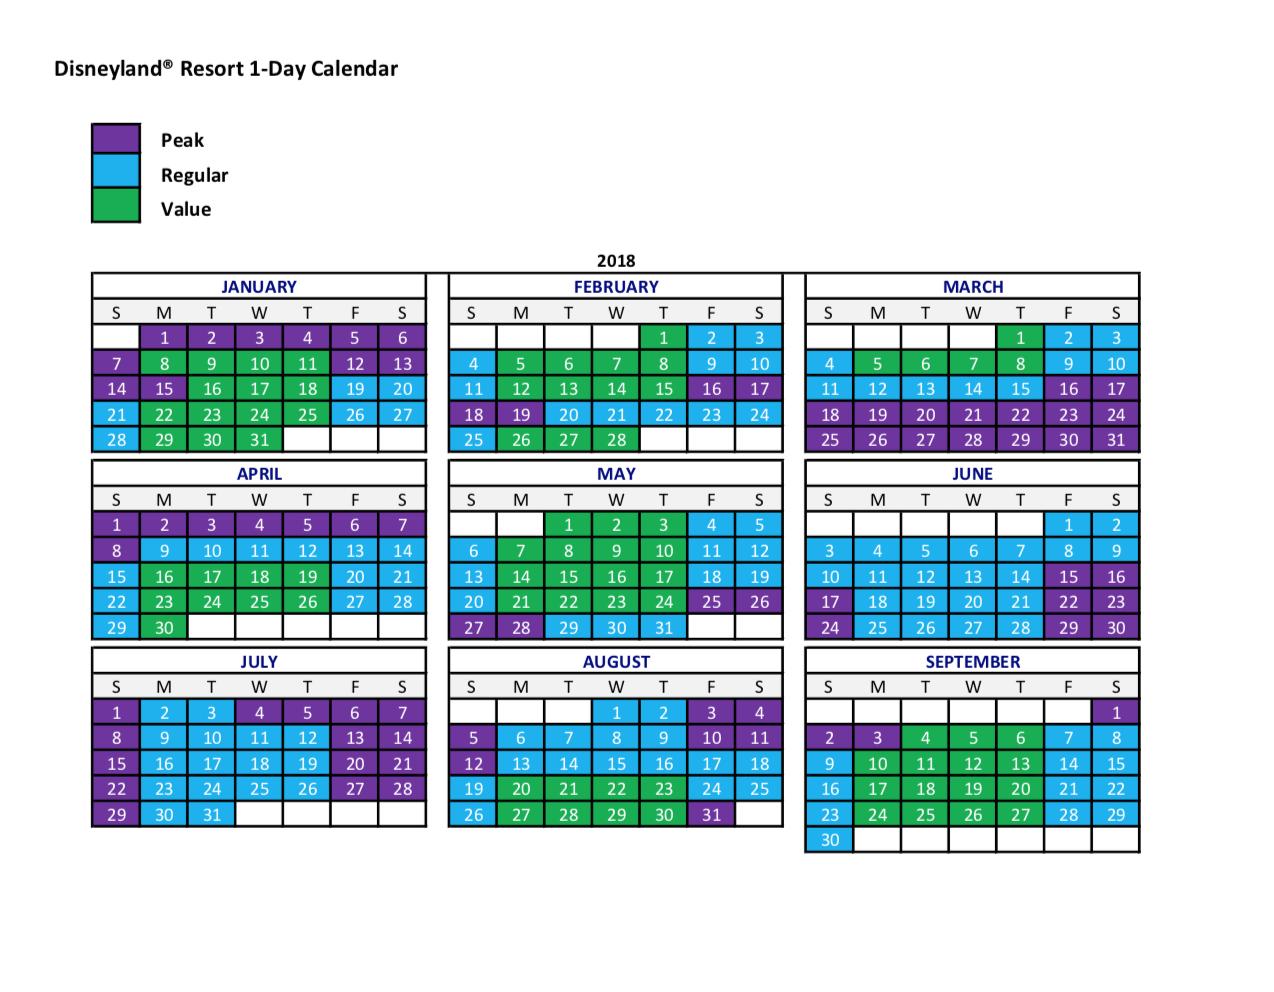 Disneyland Calendar: Peak=Peak Season; Regular=Regular Season; Value=Off Season